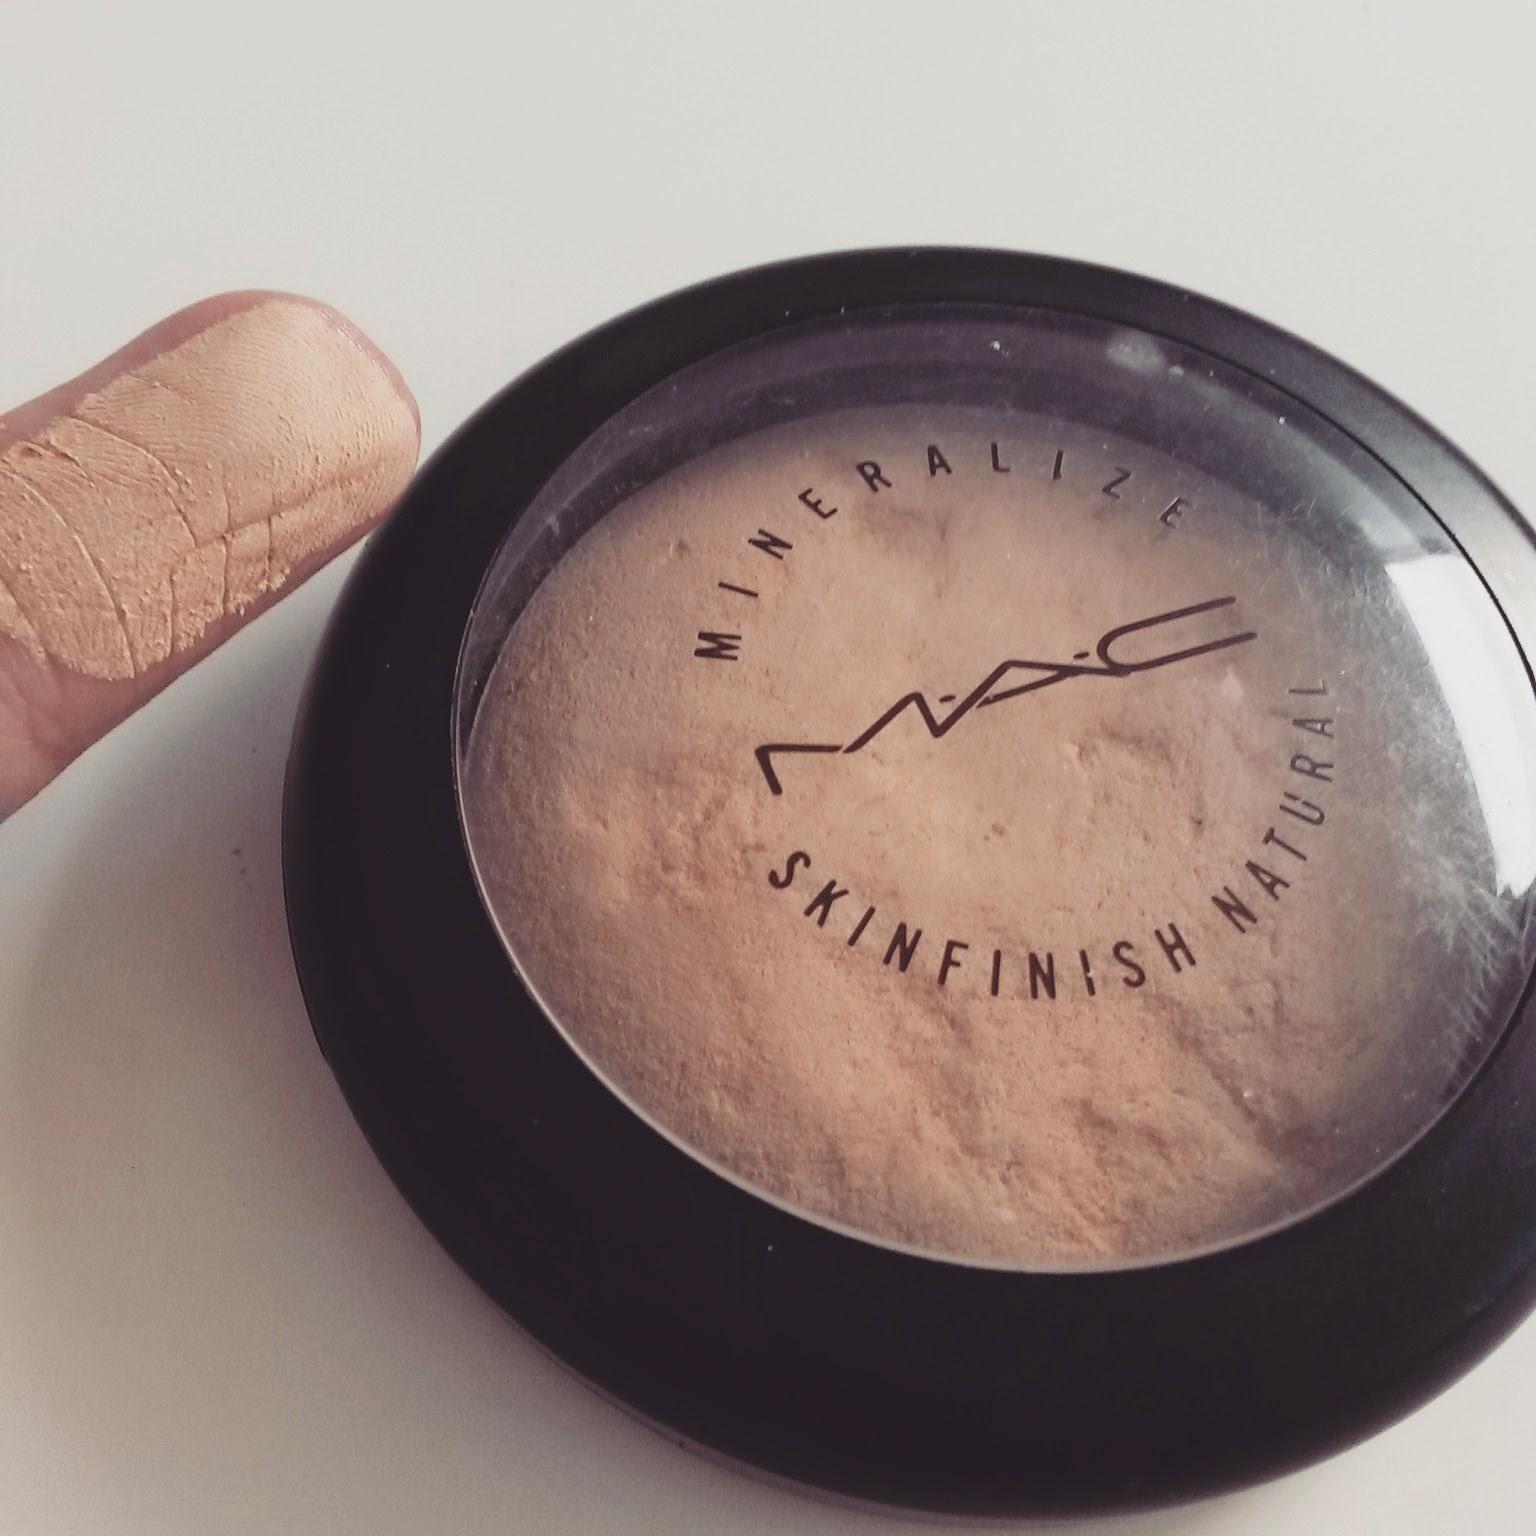 MAC Mineralize Skinfinish Natural - Medium